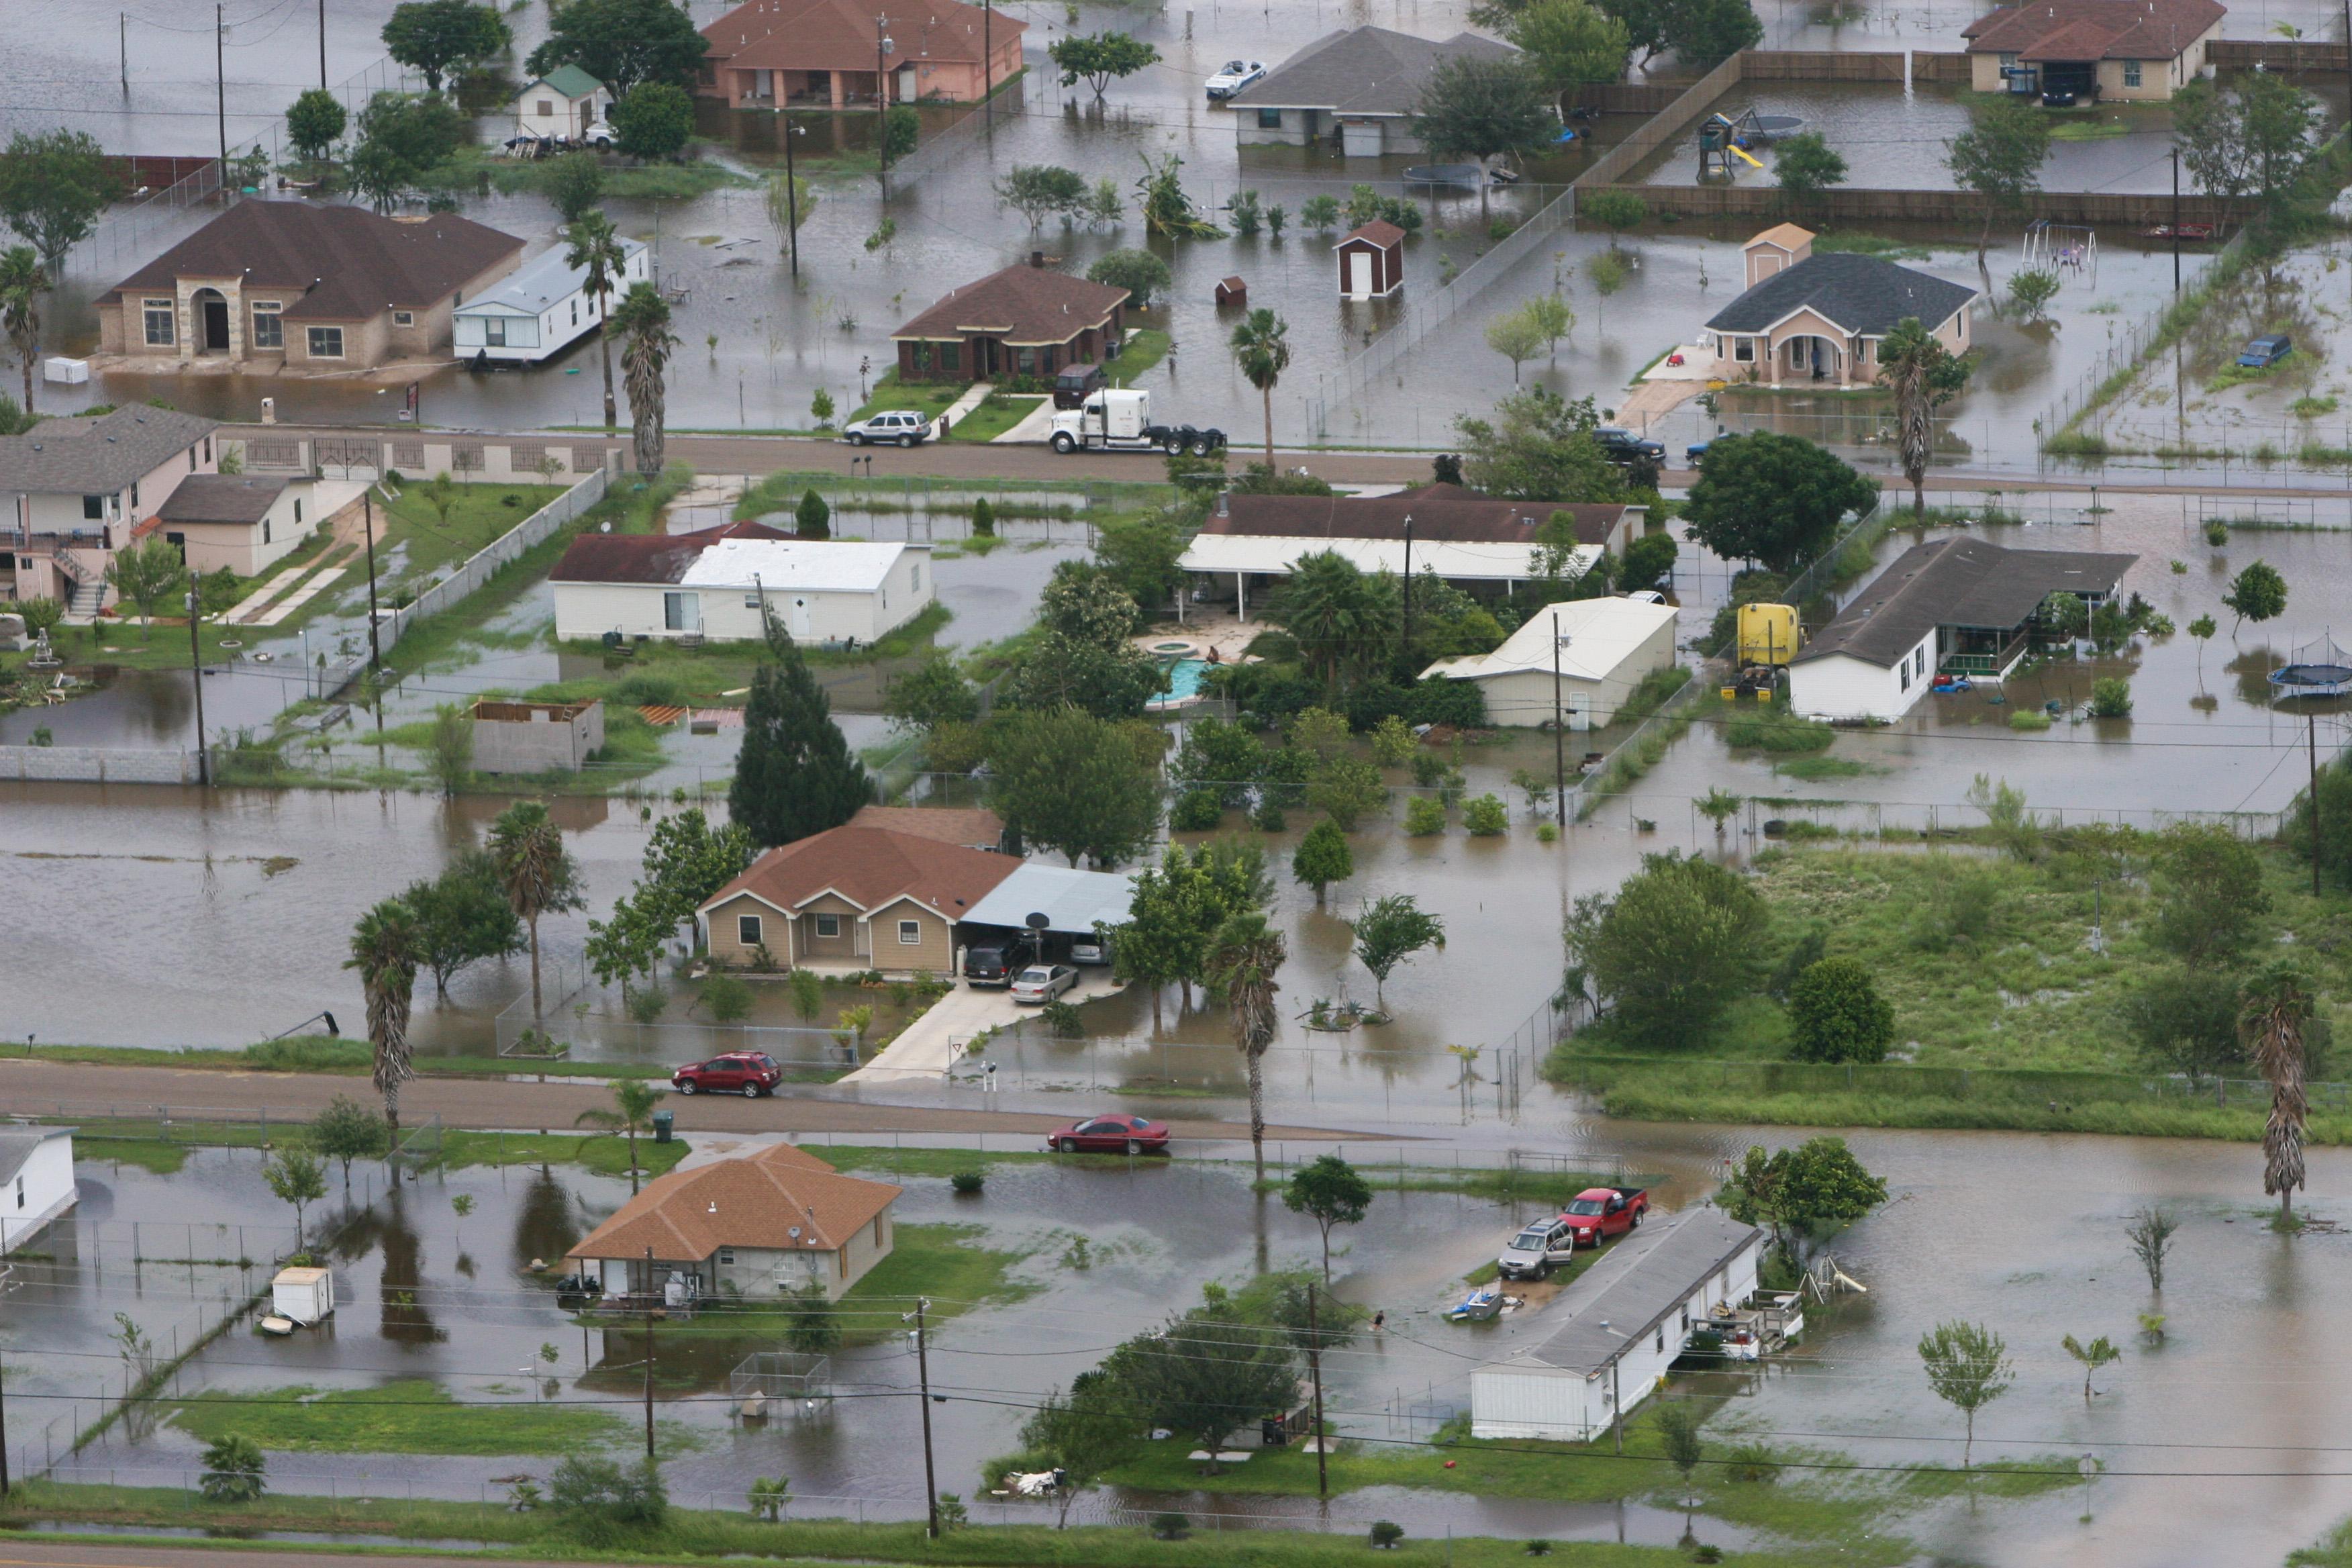 Flooded Neighboorhood In Missouri City Tx